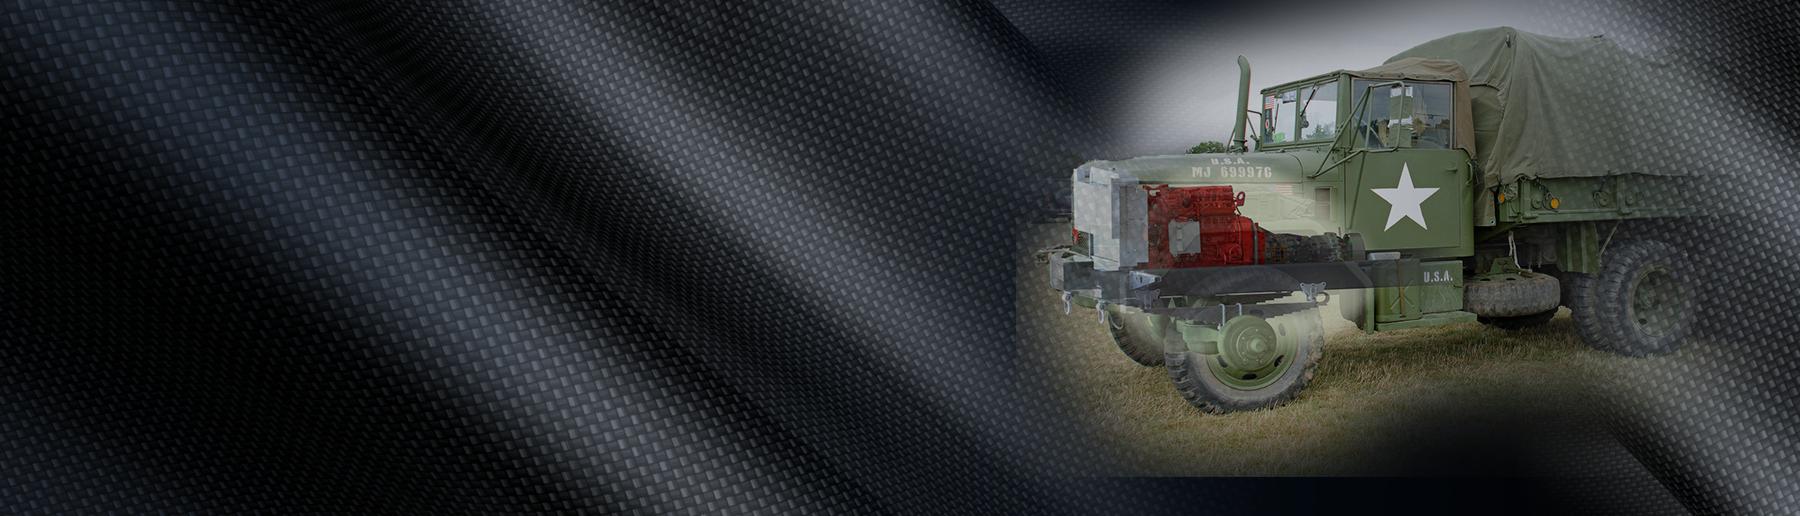 TEC-SLIDER-M35-REPOWER